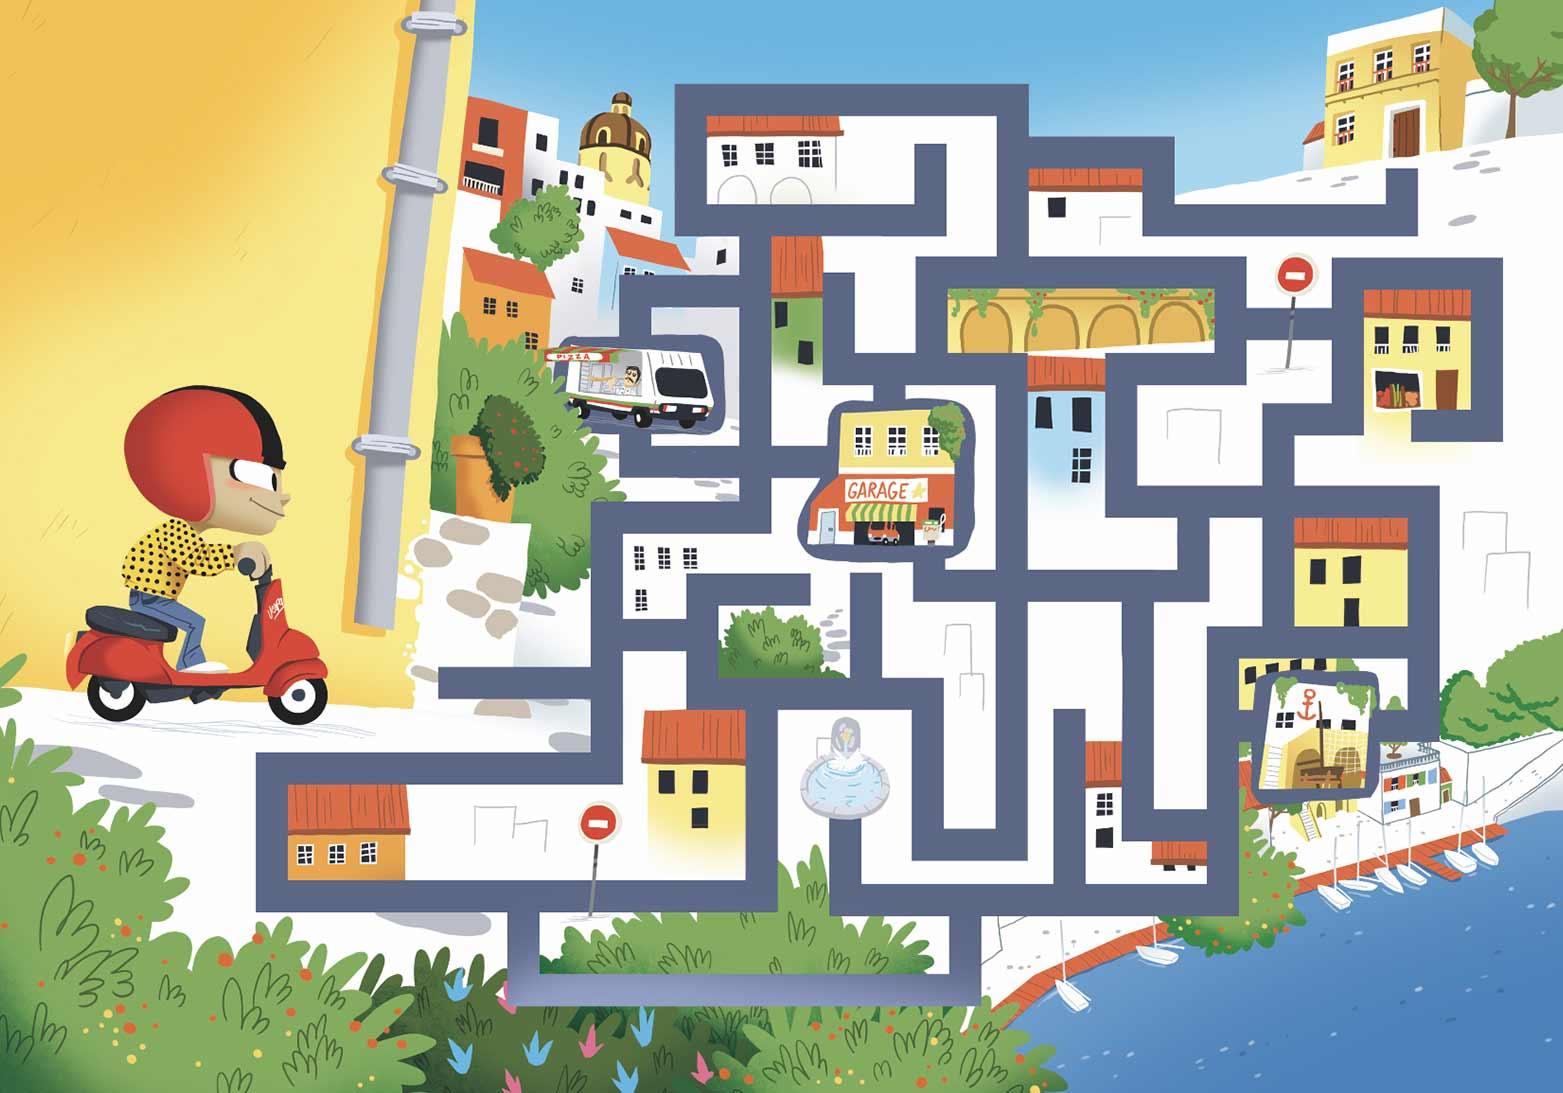 Auzou-italie-naples-labyrinthe-jeu-jeunesse-édition-édition jeunesse